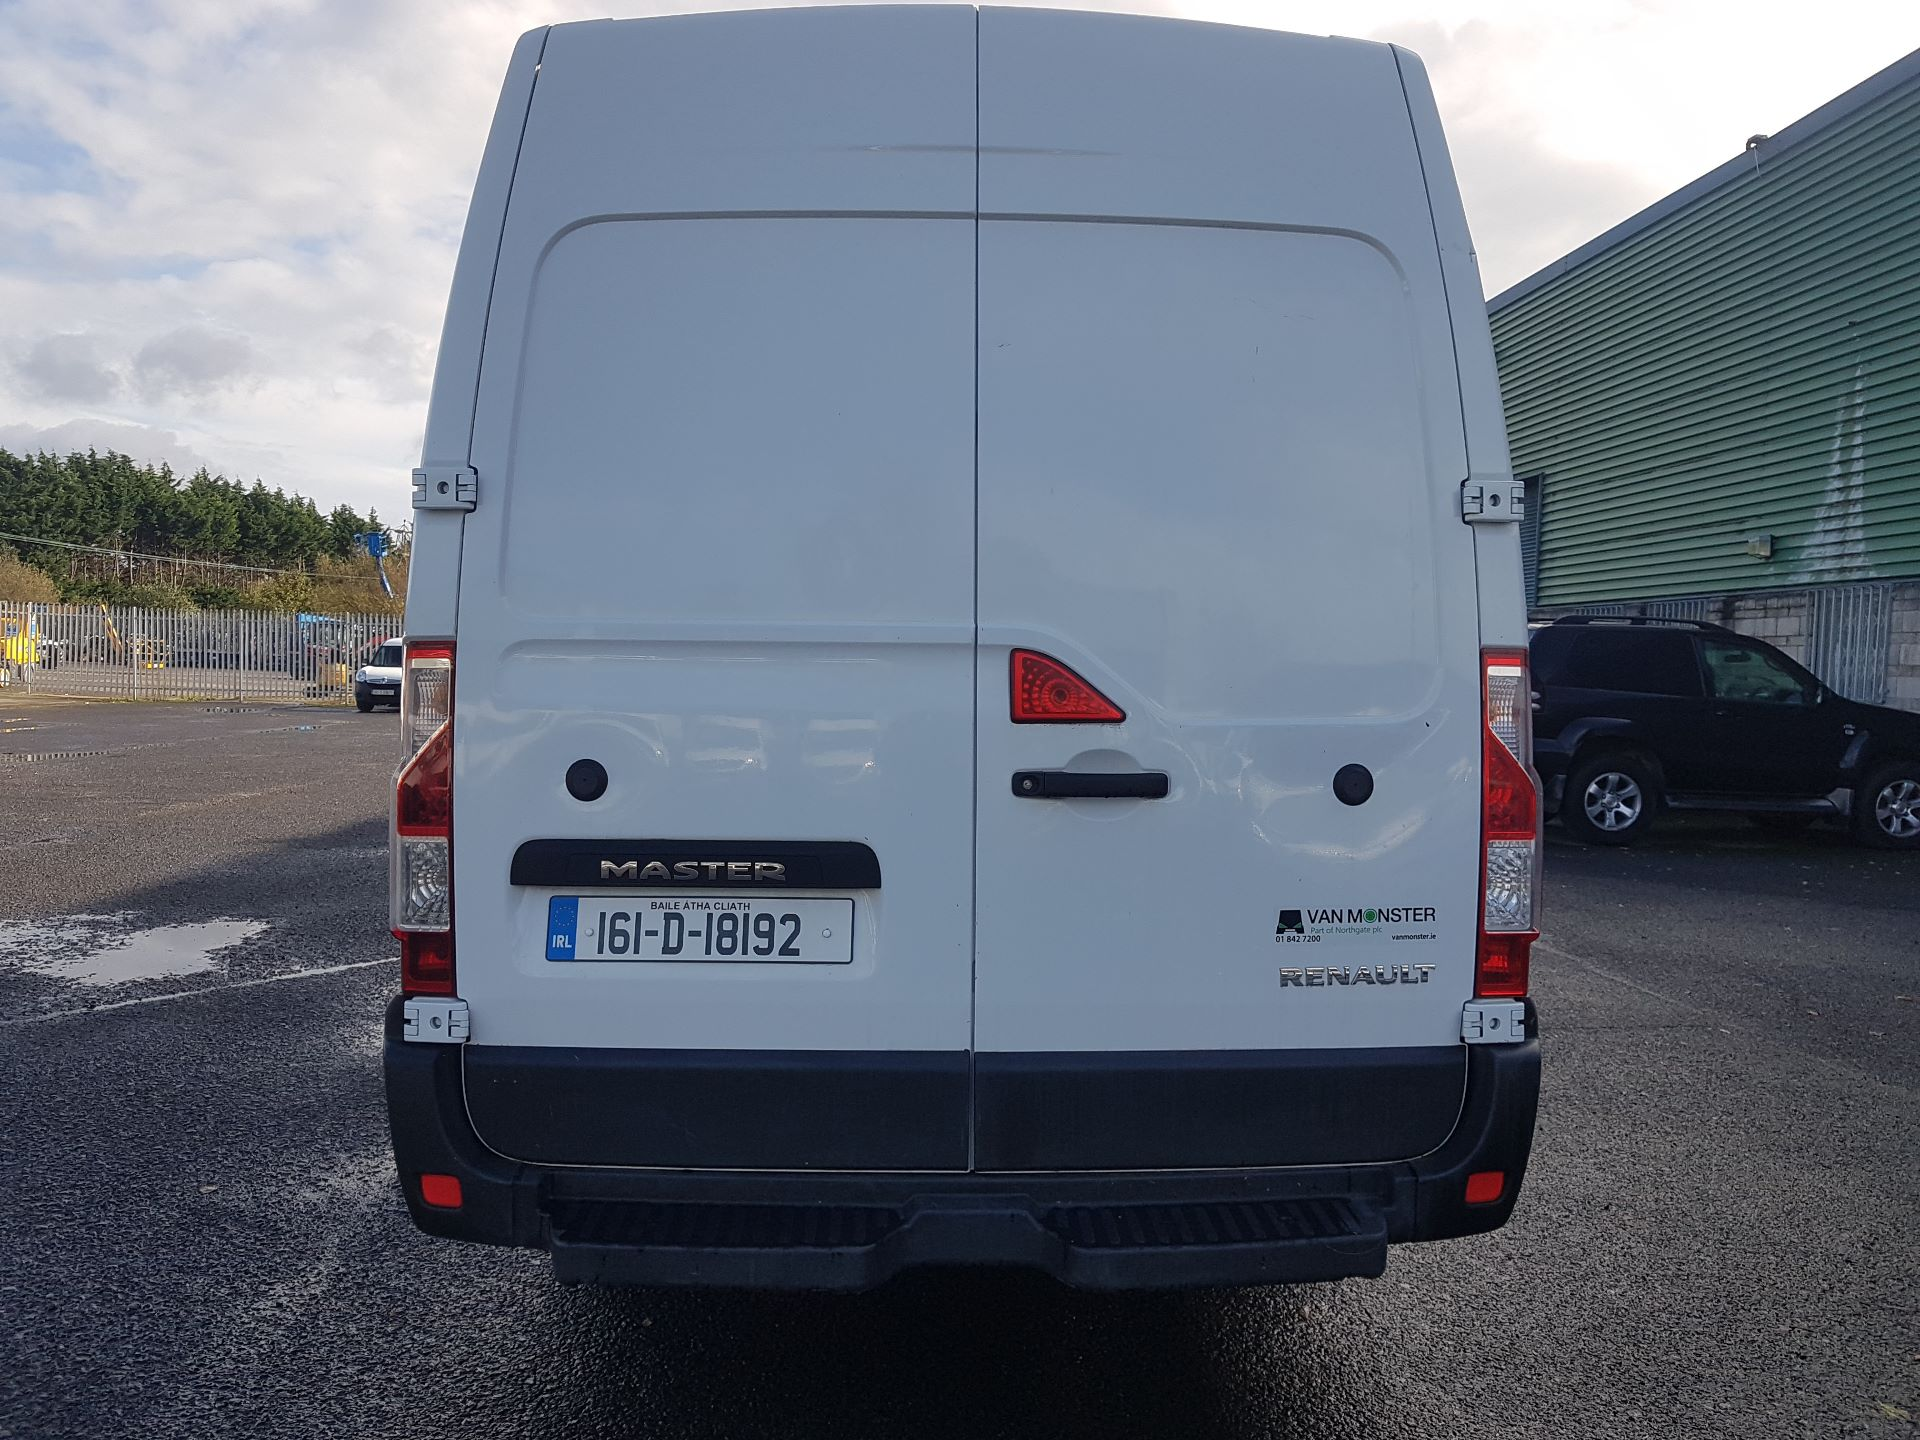 2016 Renault Master III RWD LML35 DCI 135 Energy Busin (161D18192) Image 5